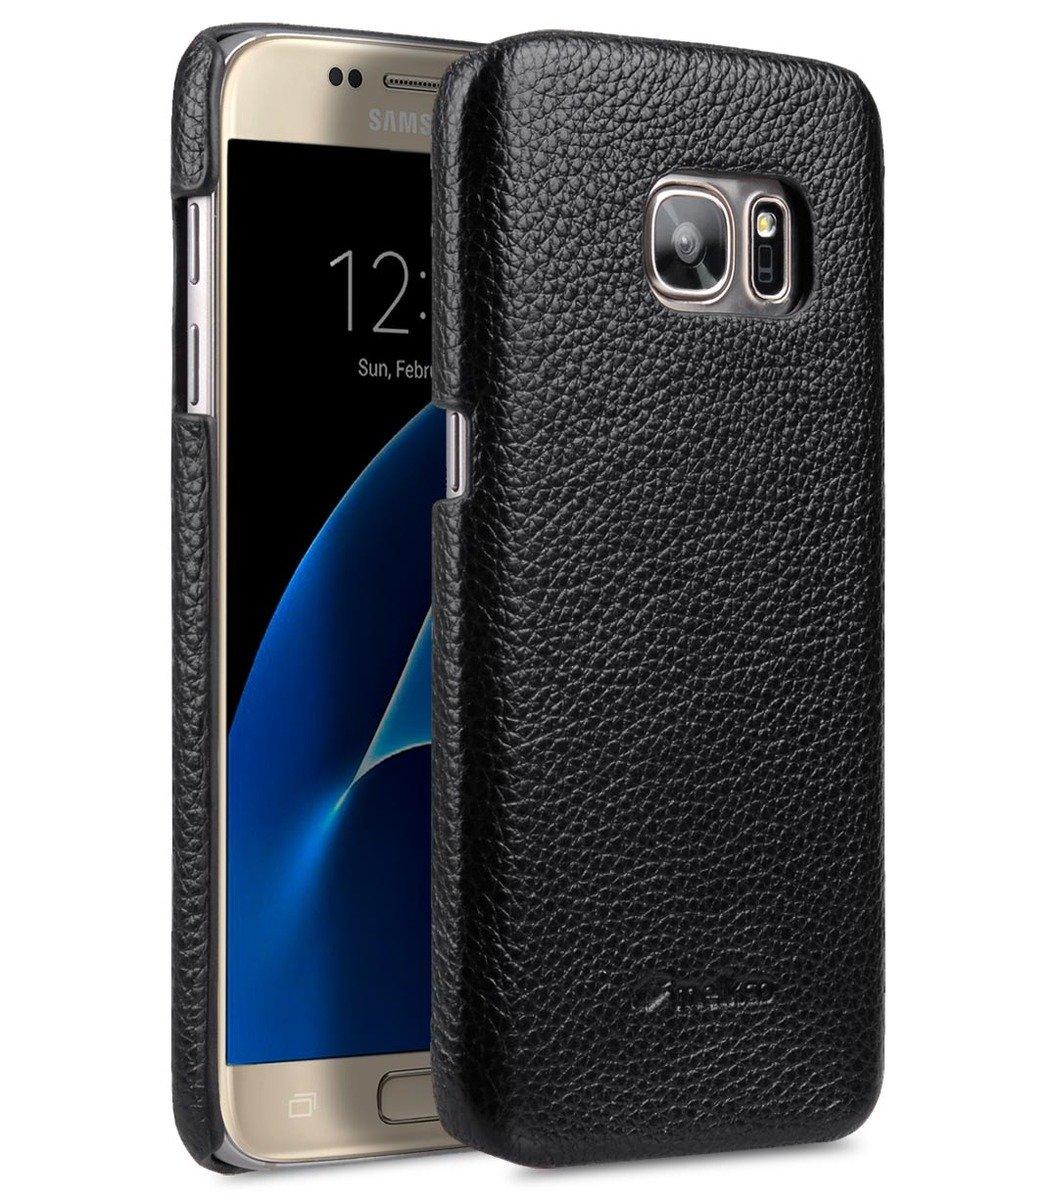 Samsung Galaxy S7 荔枝紋真皮背殼 (黑色)